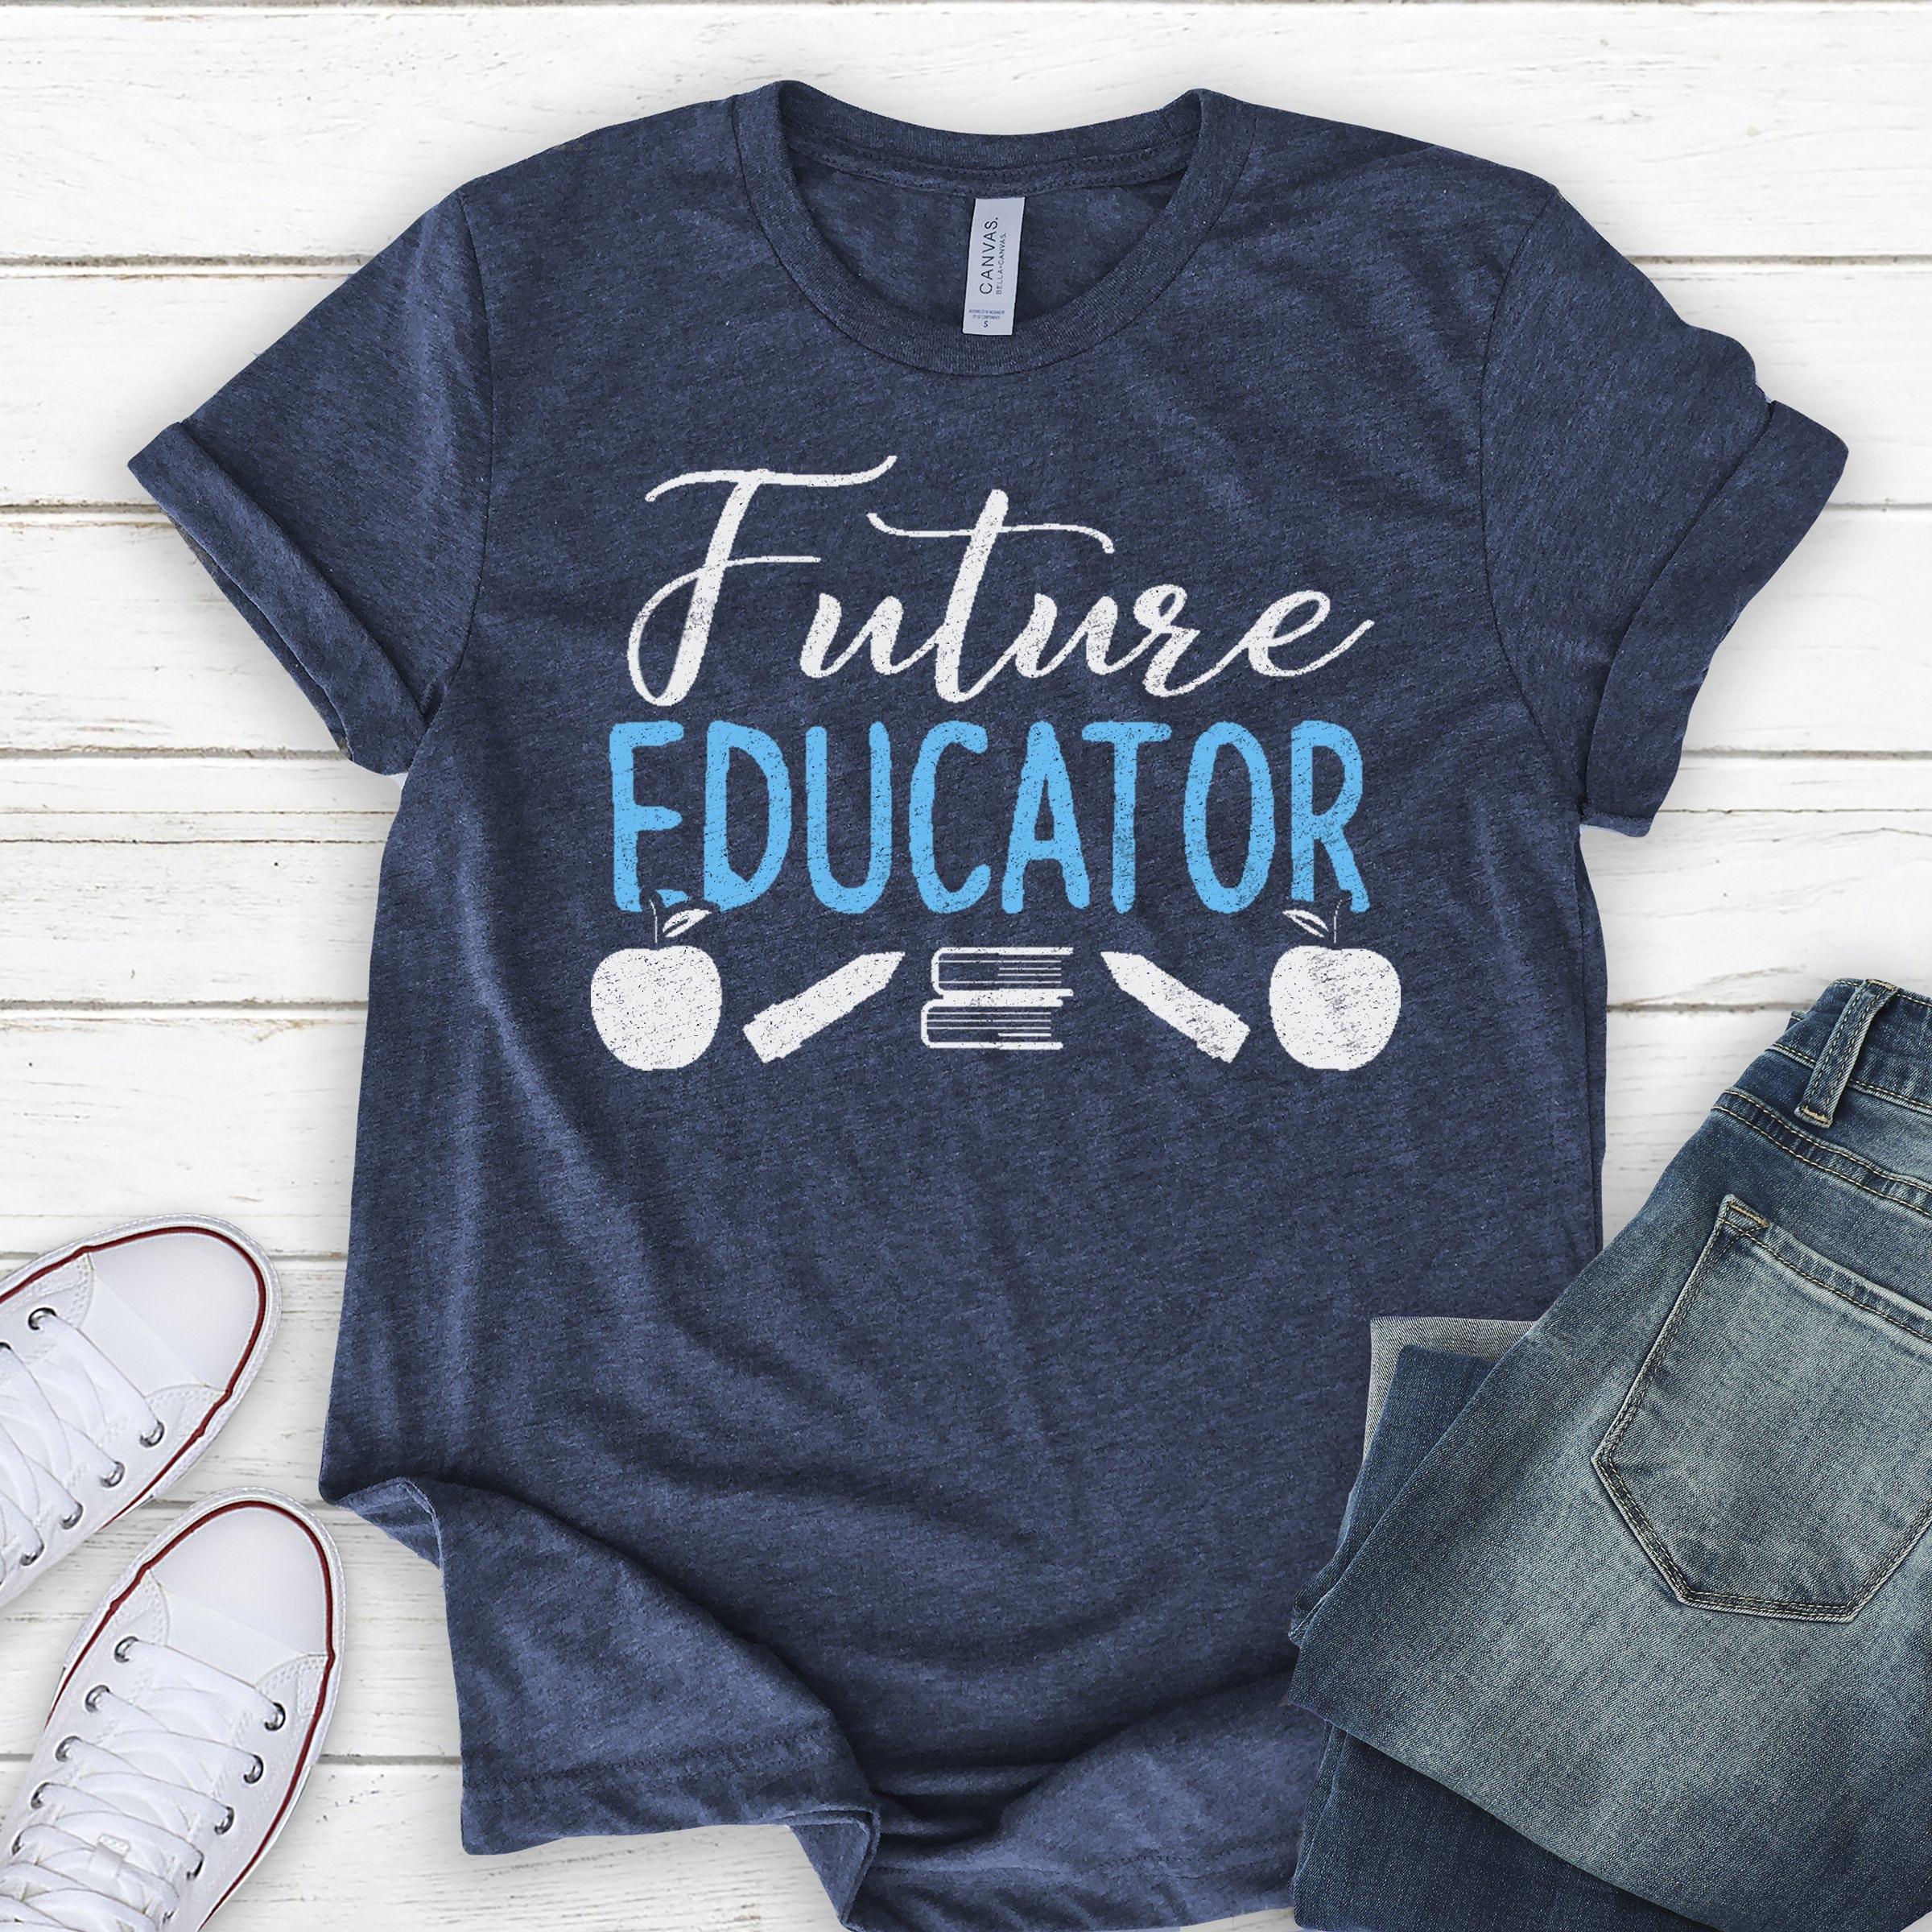 1 & Future Teacher School Shirt Graduation Gift Ideas College Gift For ...